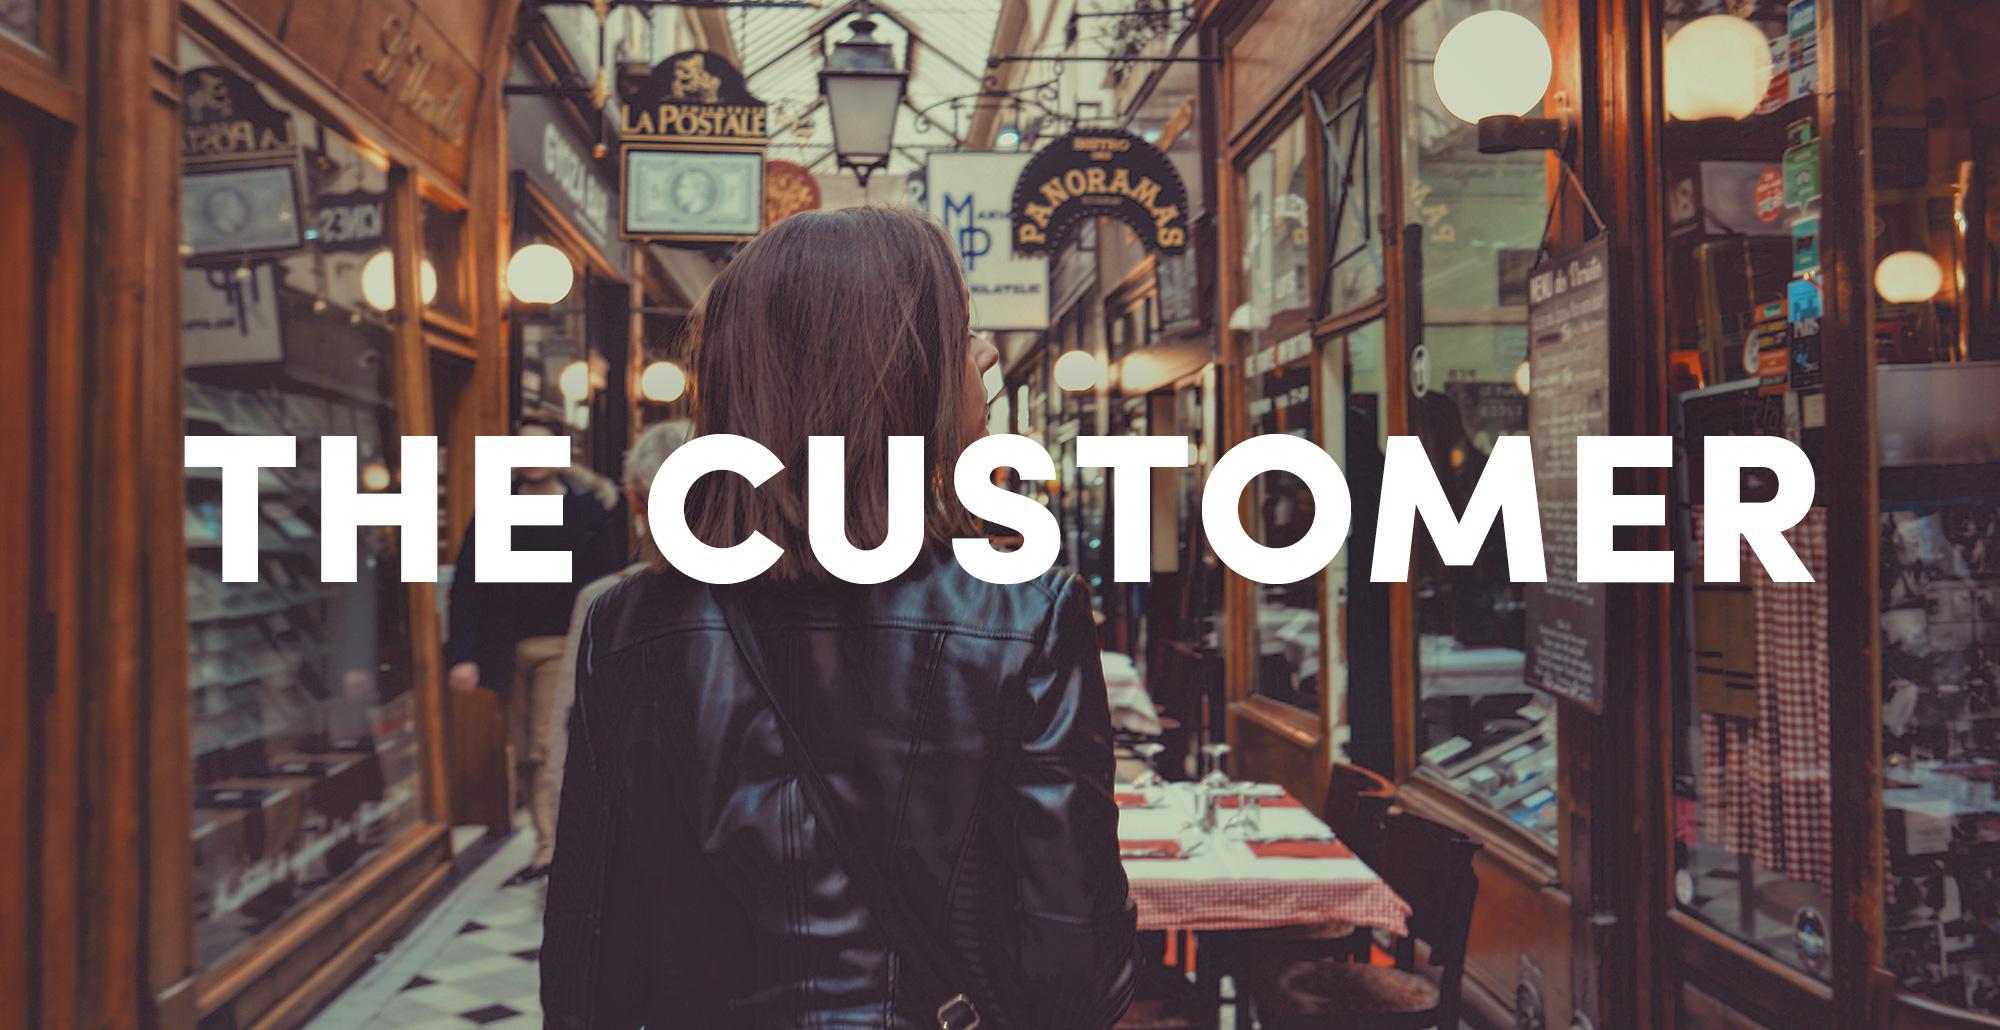 Customers POV